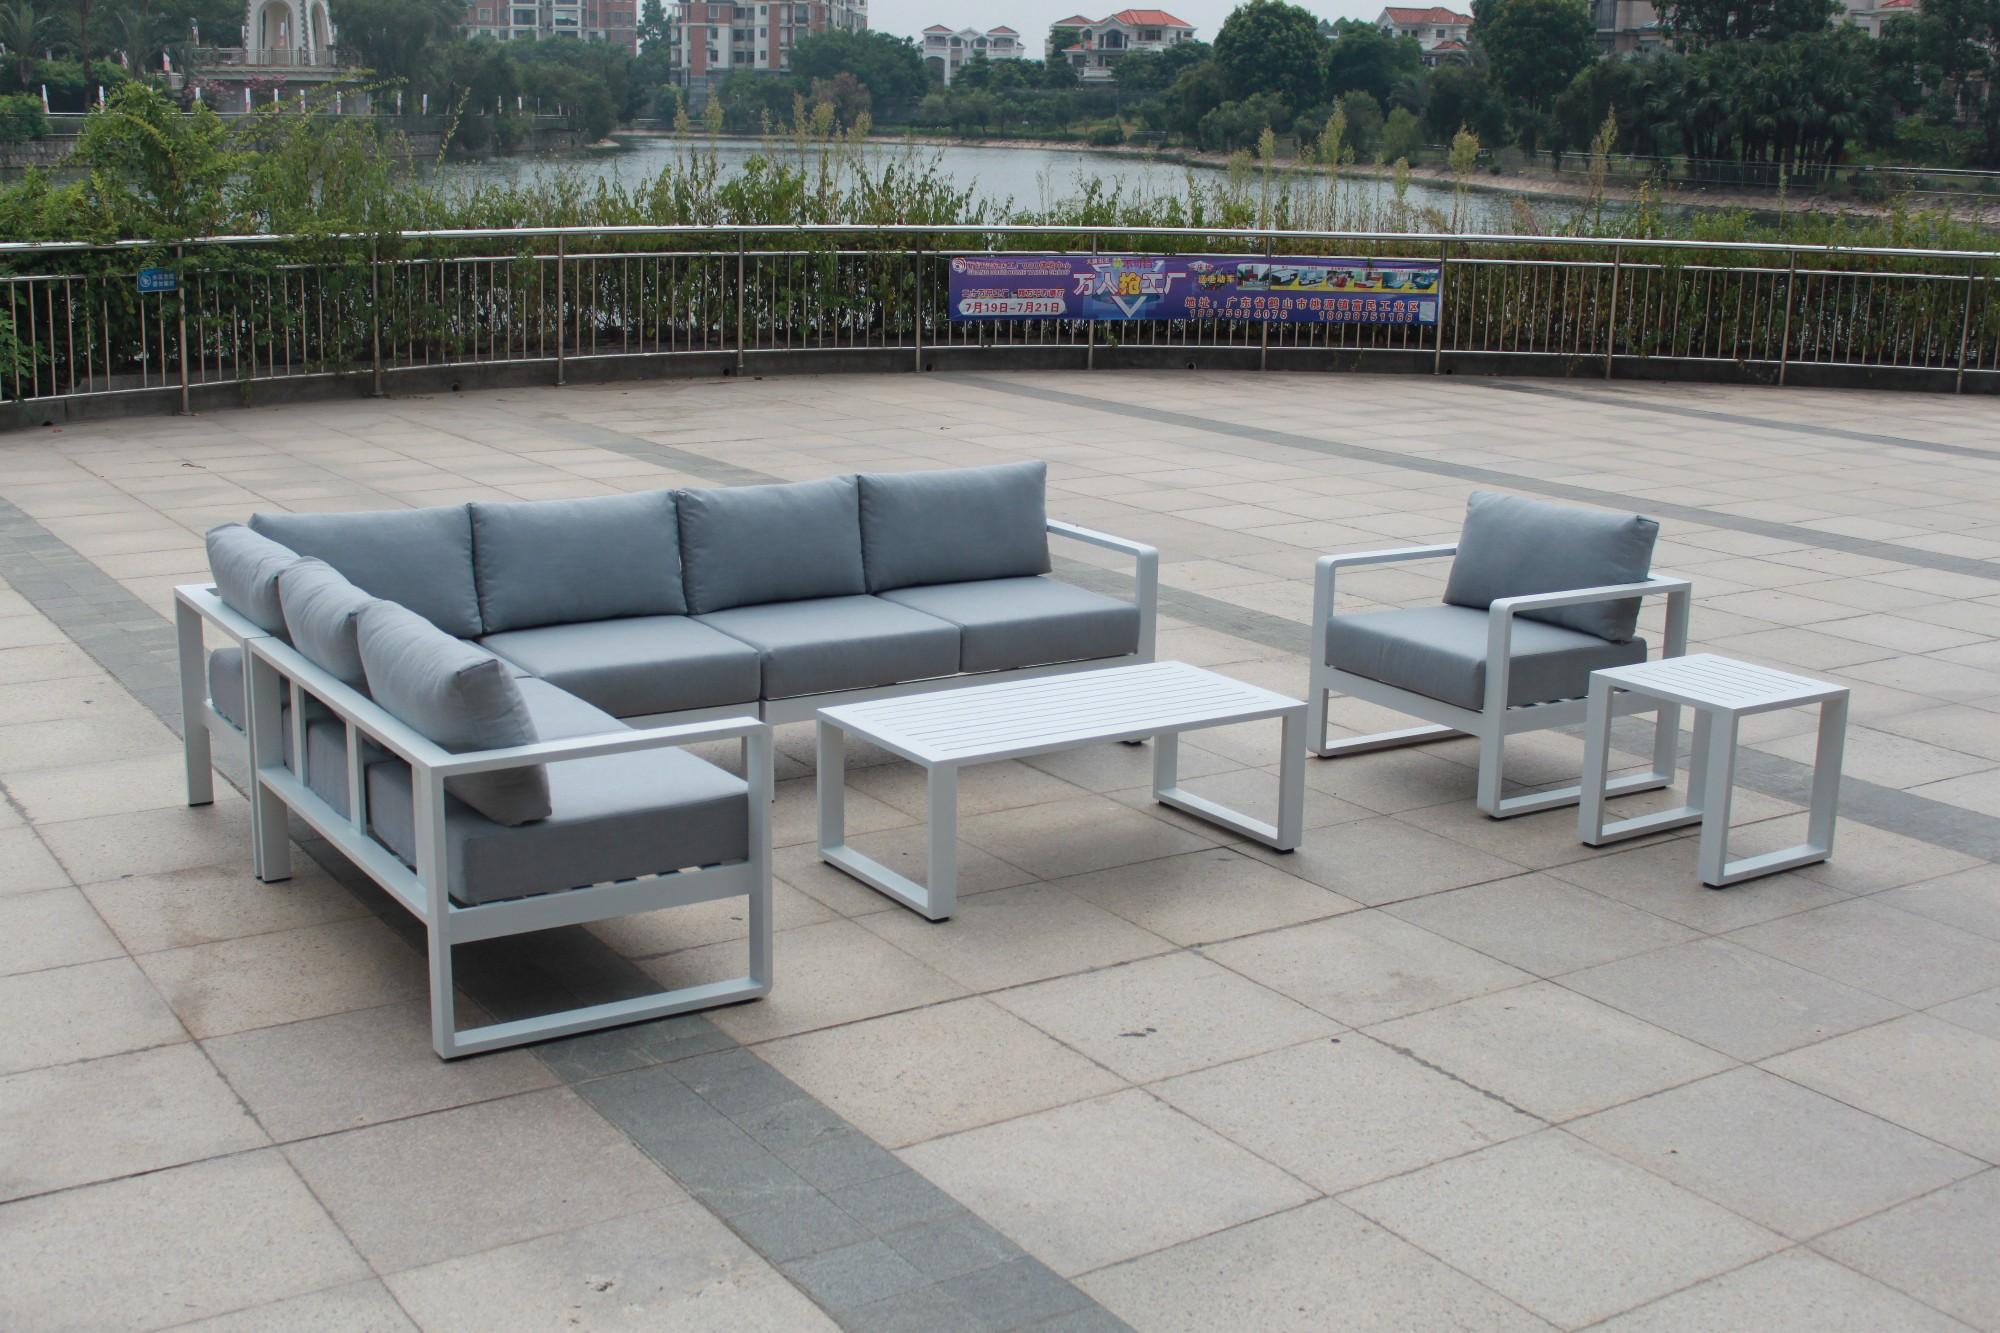 L Shaped Garden Furniture Outdoor Sofa Manufacturers, L Shaped Garden Furniture Outdoor Sofa Factory, Supply L Shaped Garden Furniture Outdoor Sofa